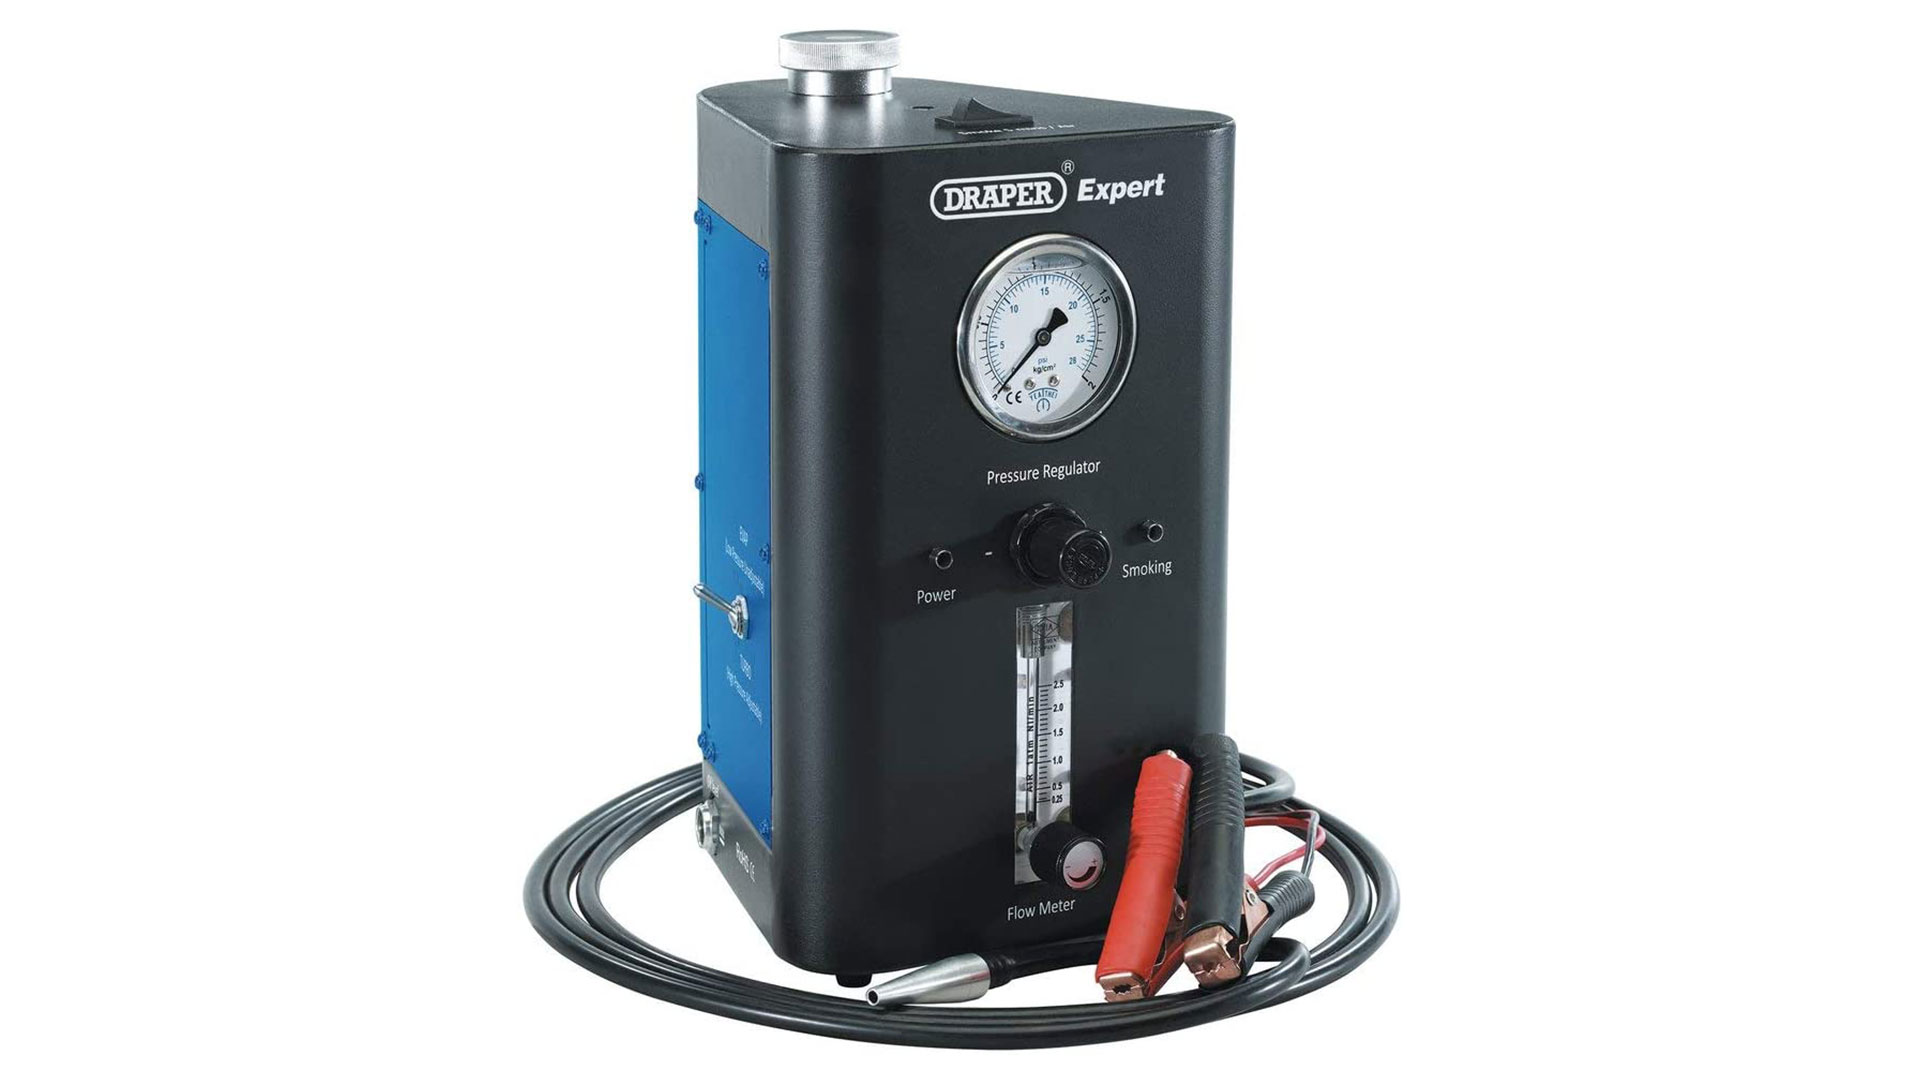 draper 94079 turbo evap smoke diagnostic machine